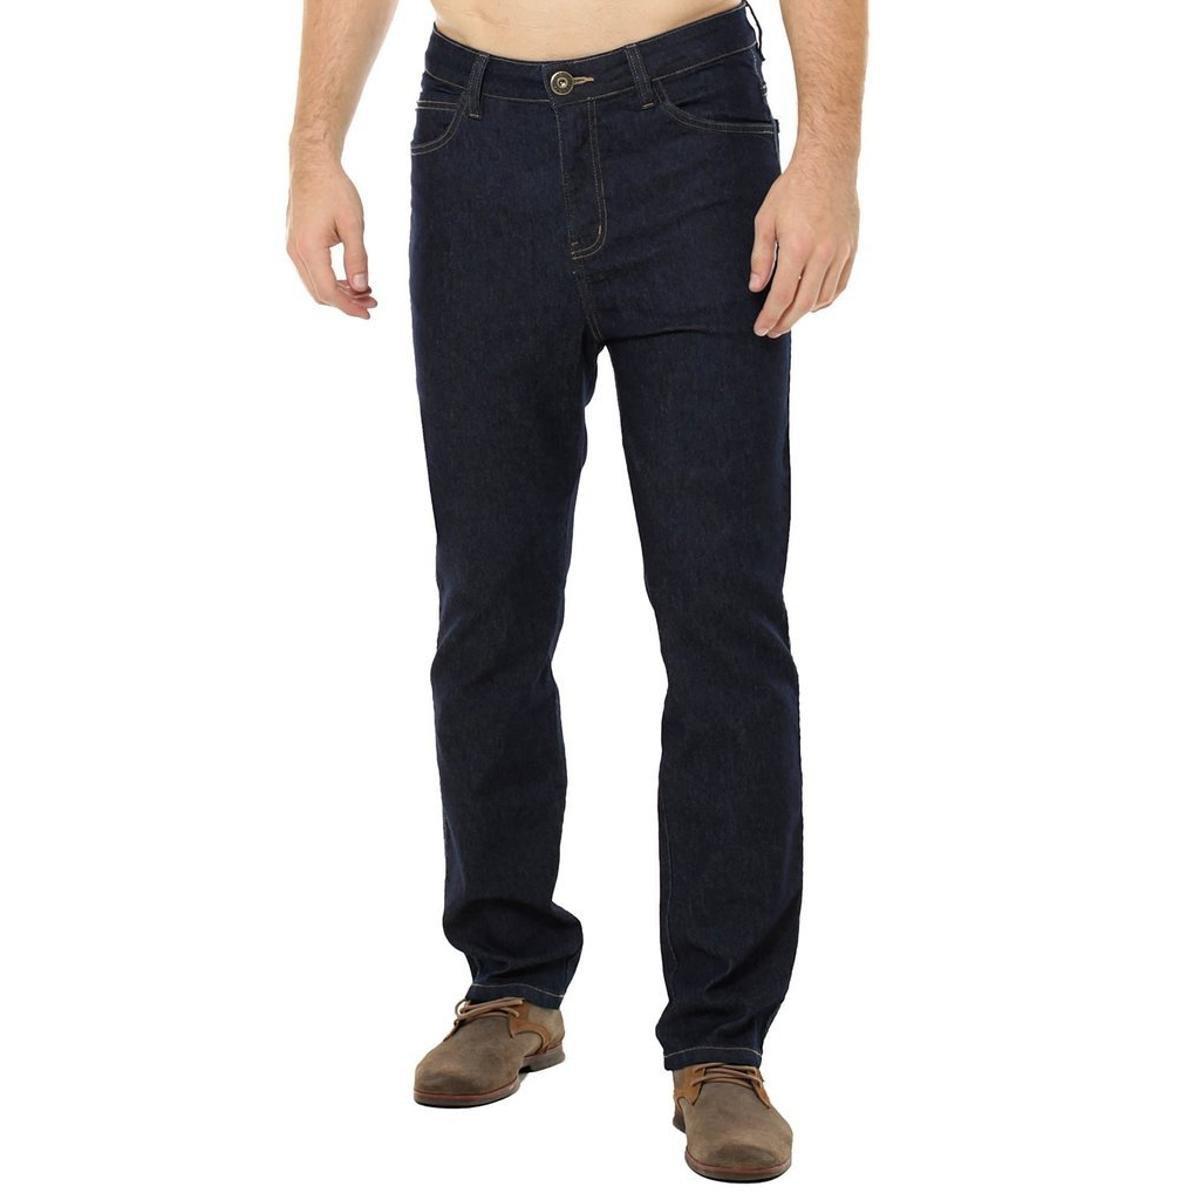 c9324d90f Calça Jeans Osmoze Mid Rise Feminino - Compre Agora | Zattini